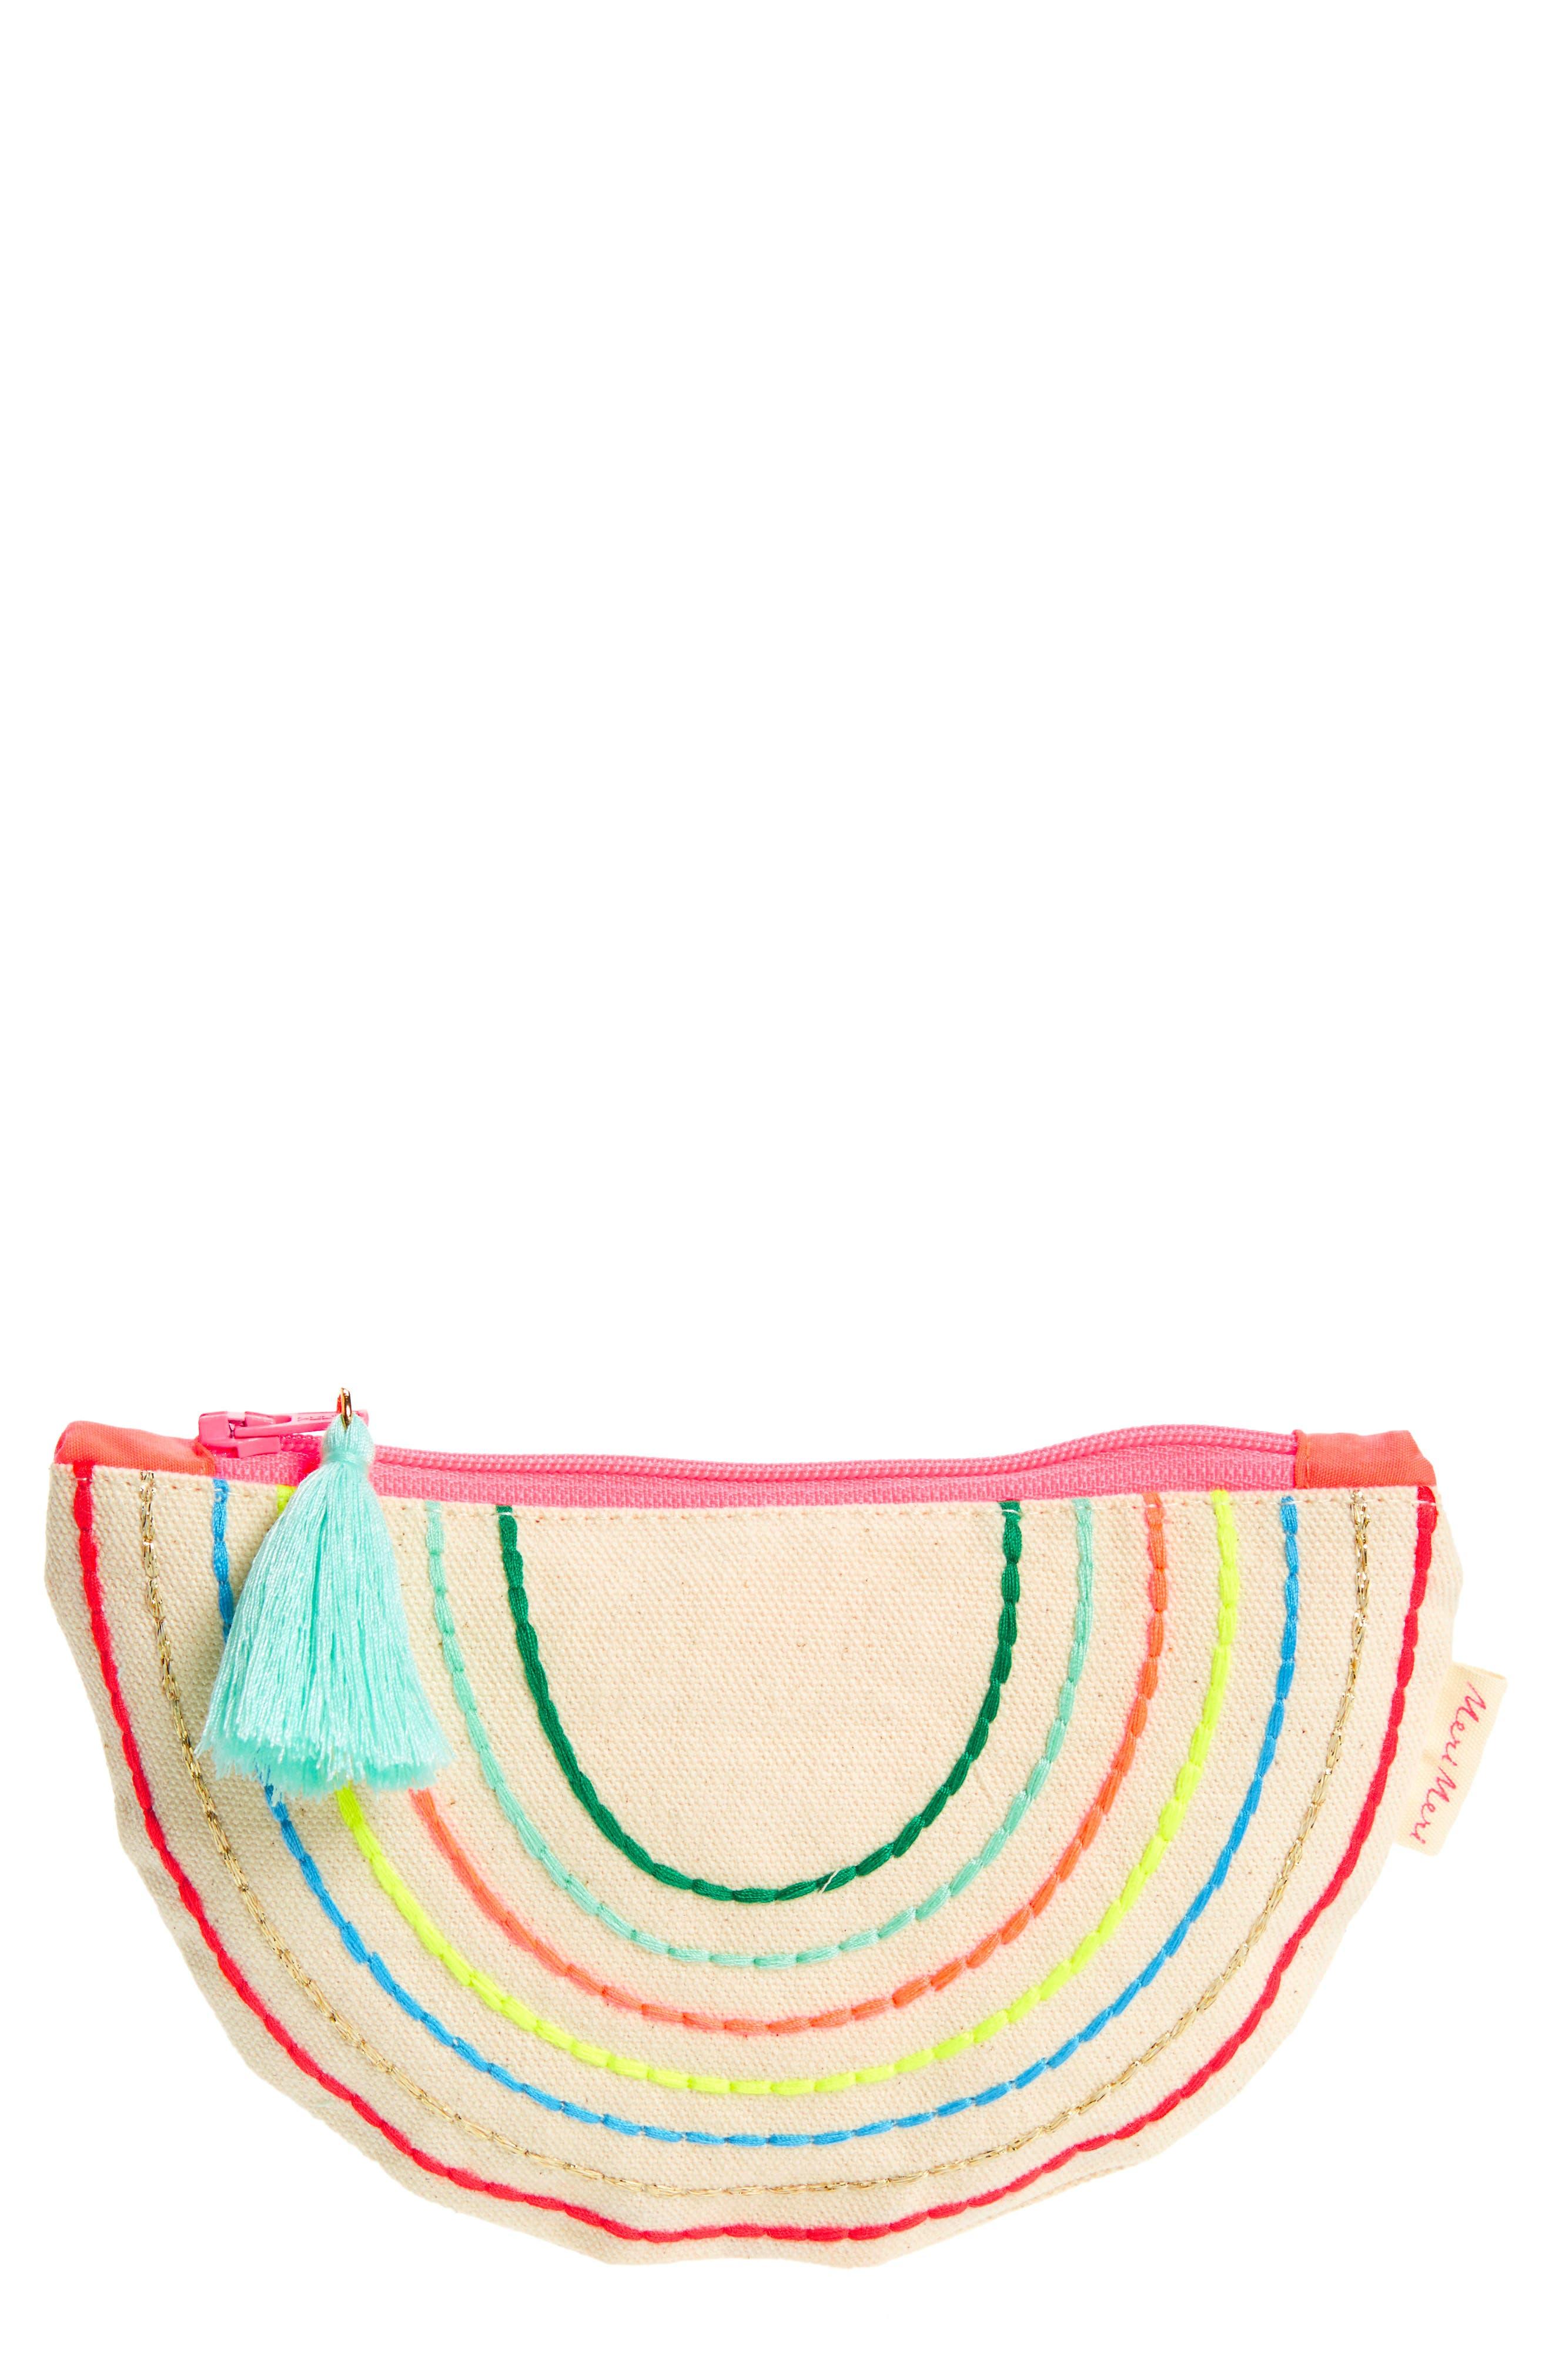 Rainbow Zip Pouch,                         Main,                         color, 900